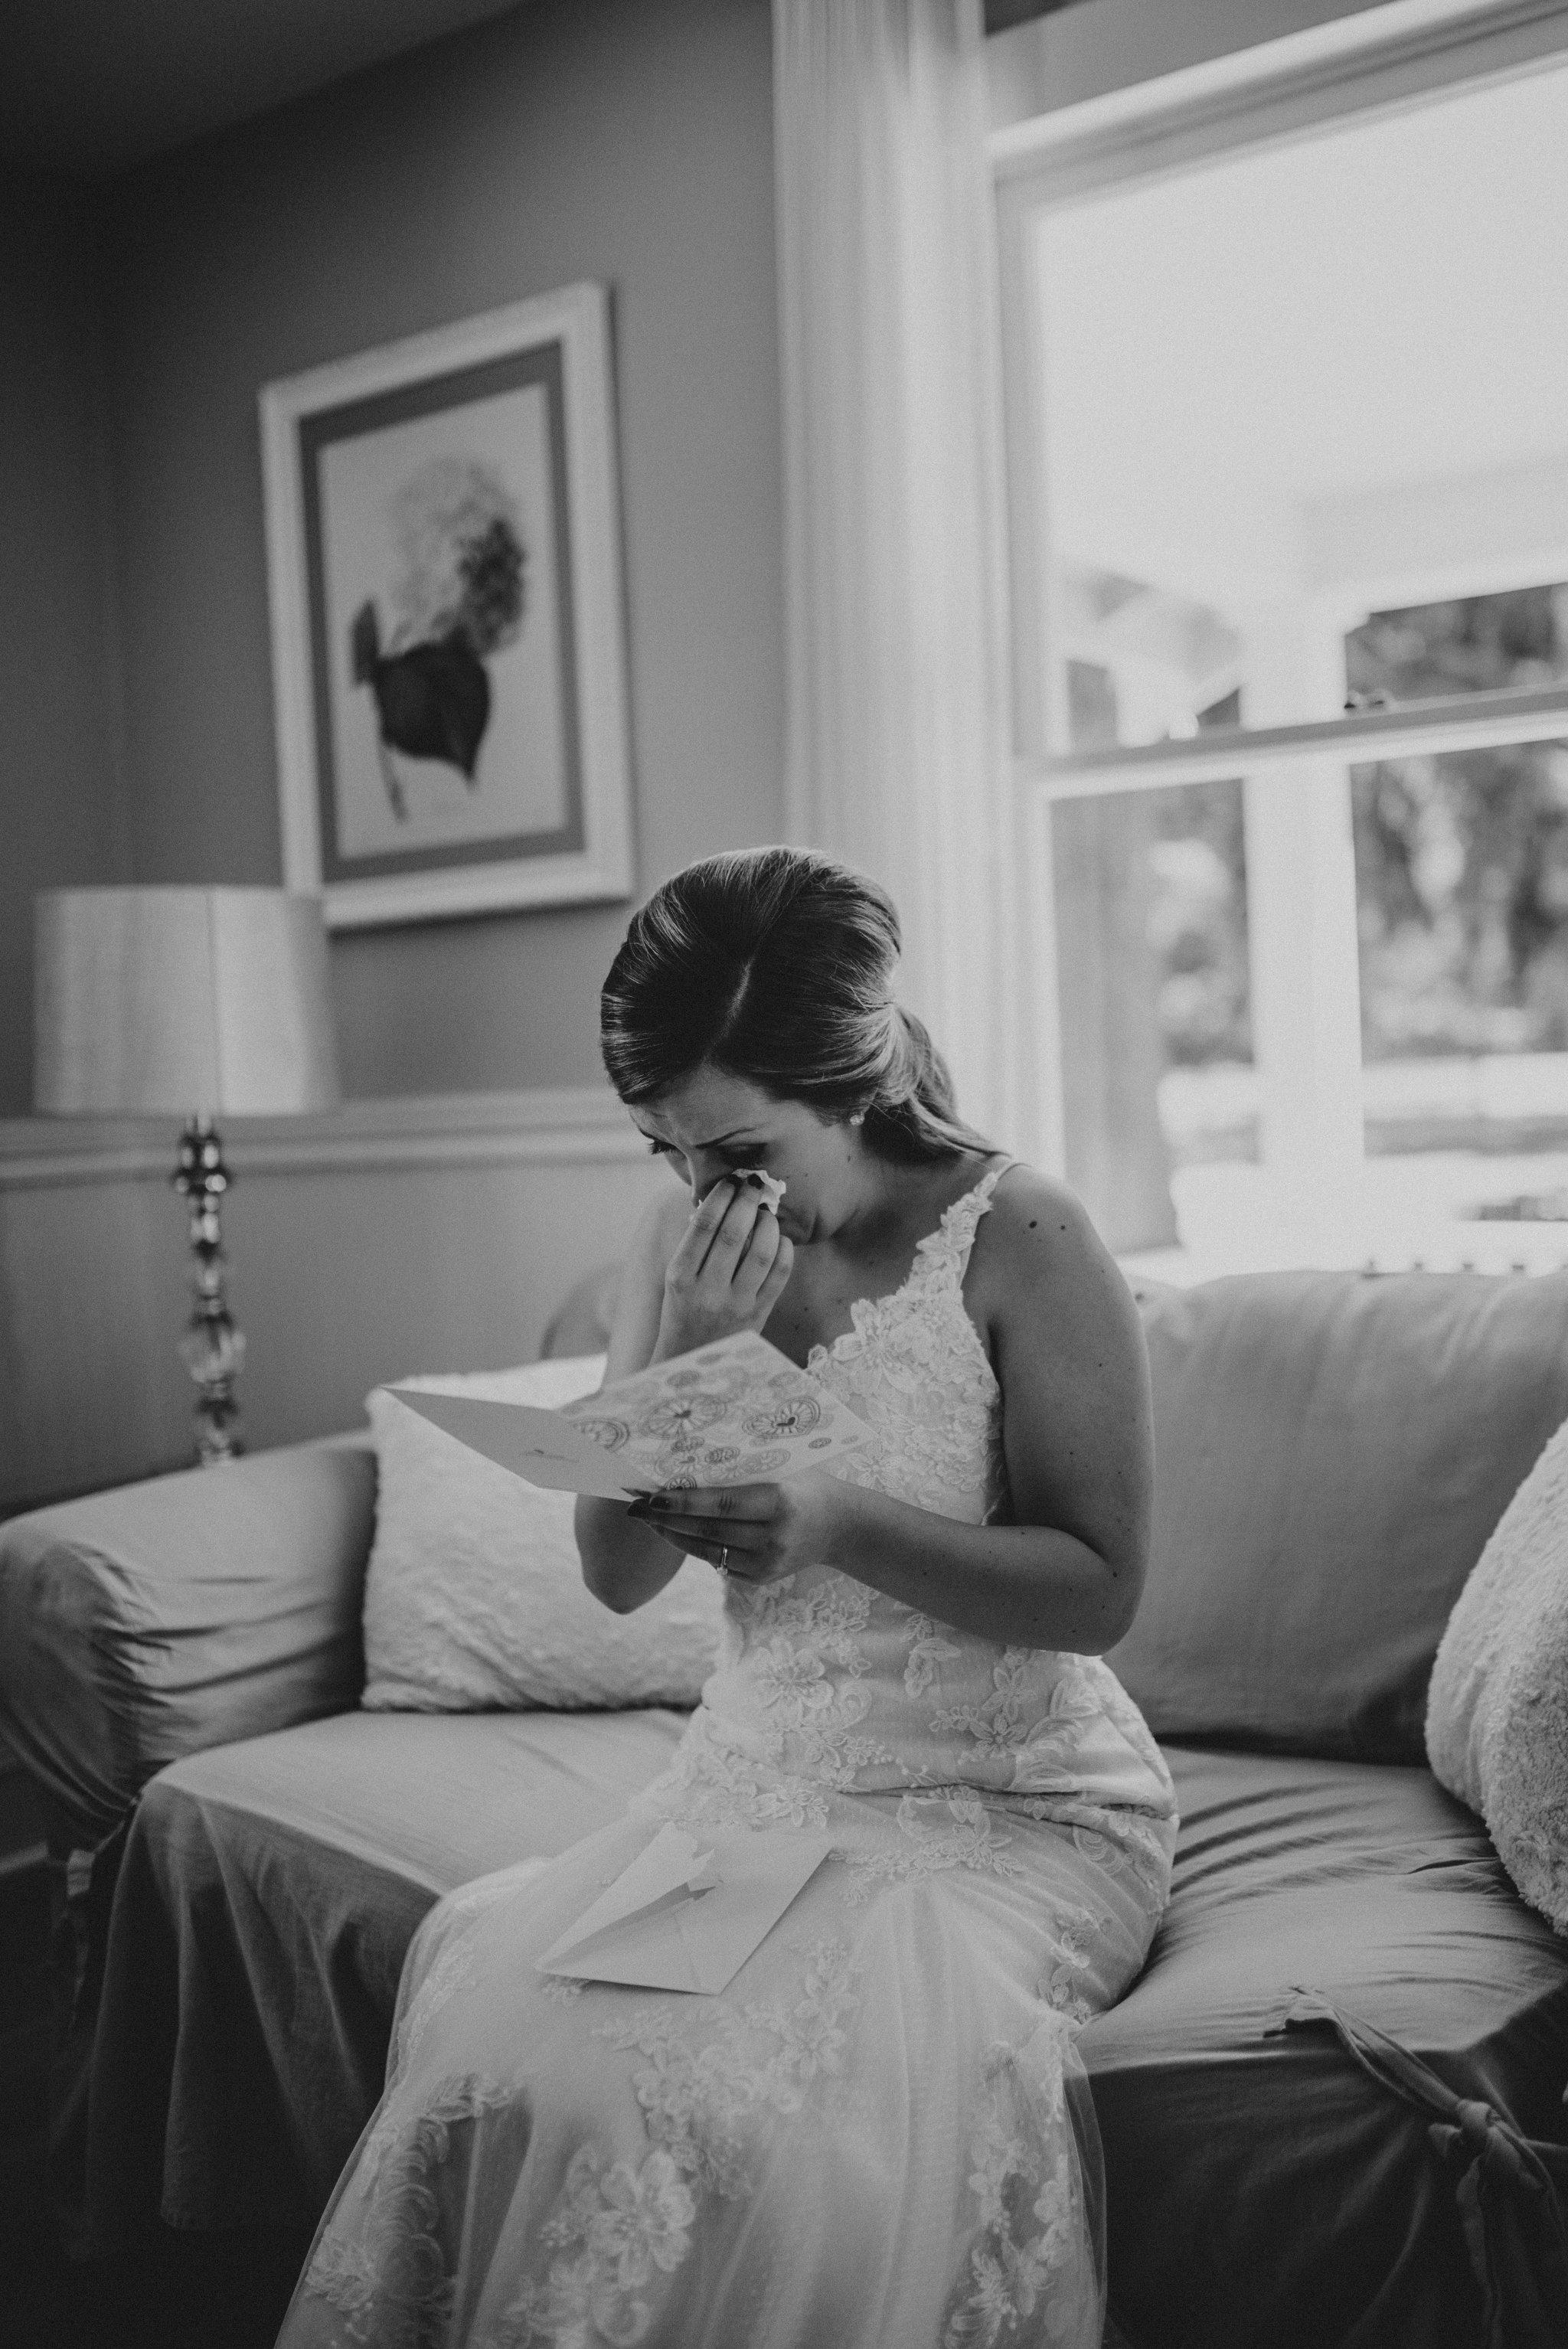 kristen-and-cody-the-kelley-farm-wedding-seattle-photographer-caitlyn-nikula-18.jpg